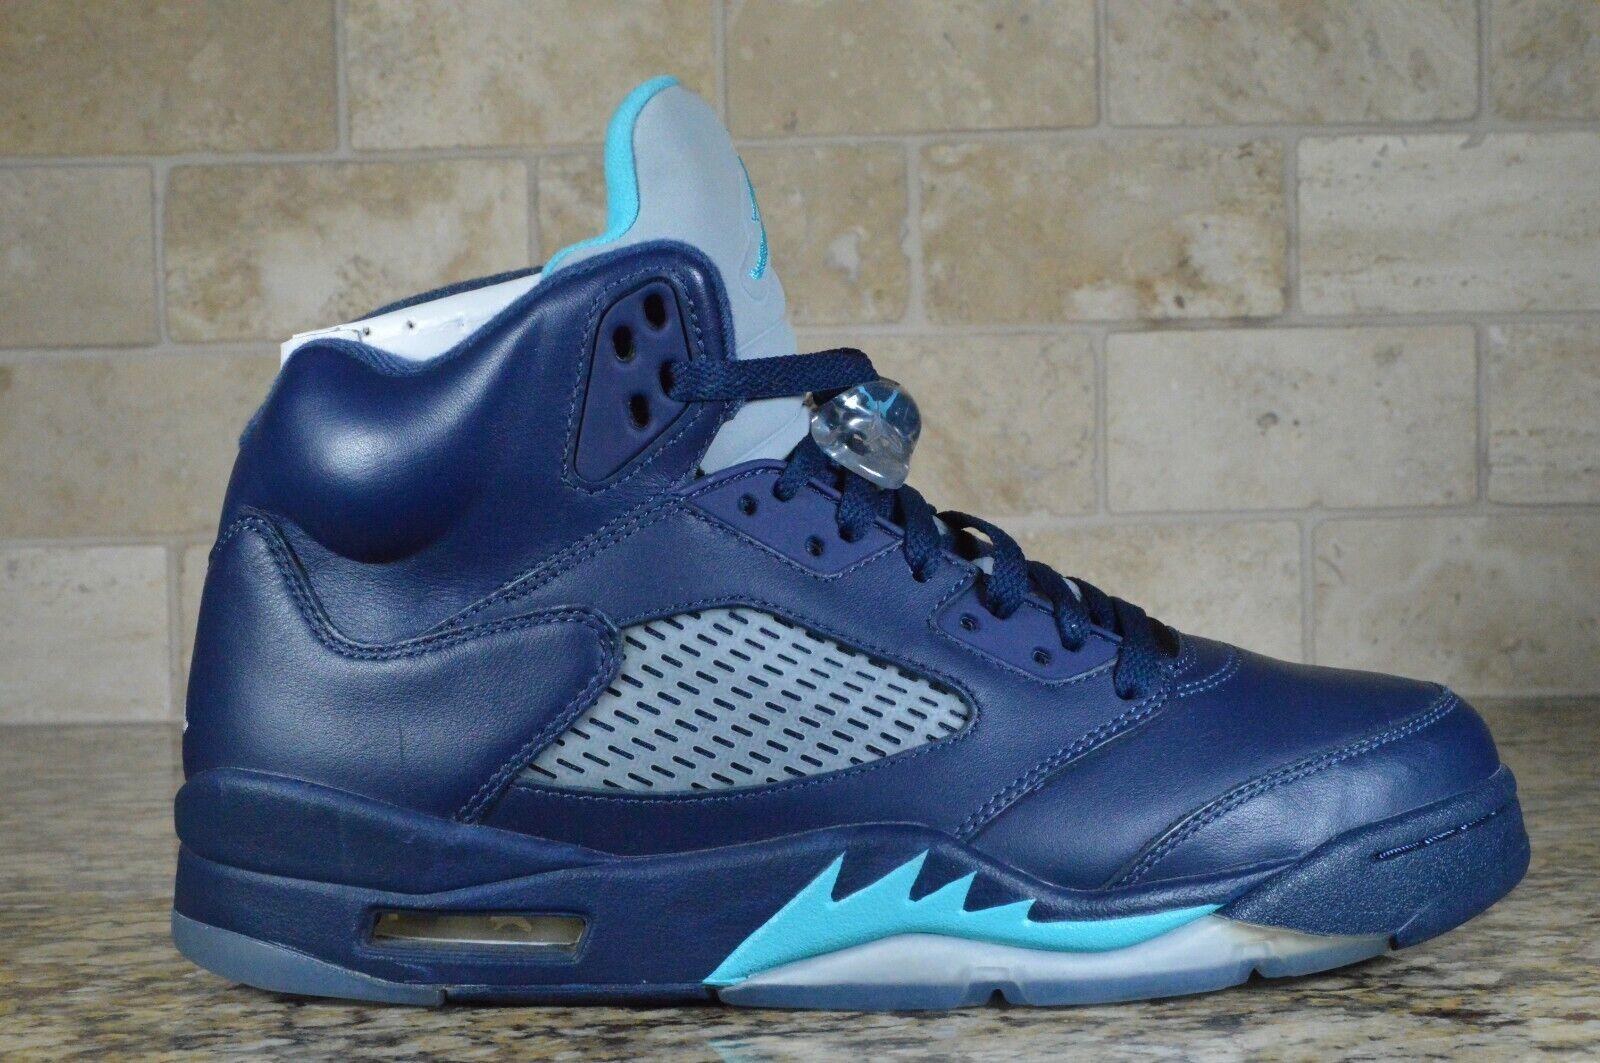 2014 Nike Air Jordan 5 Retro Pre Grape